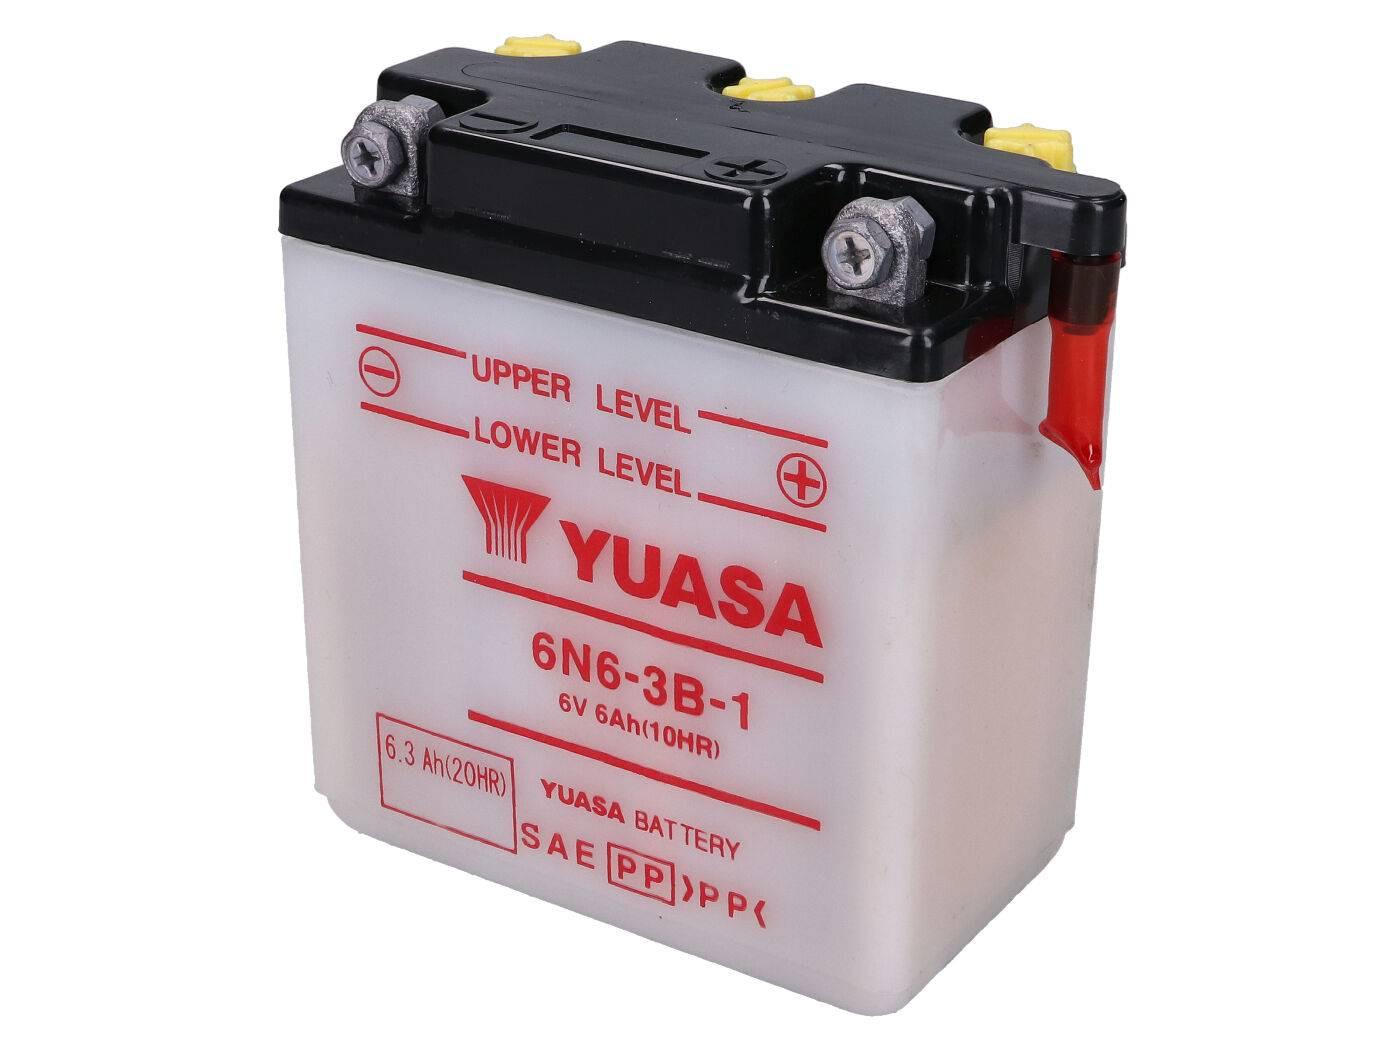 Yuasa 6N6-3B-1 akkumulátor - savcsomag nélkül